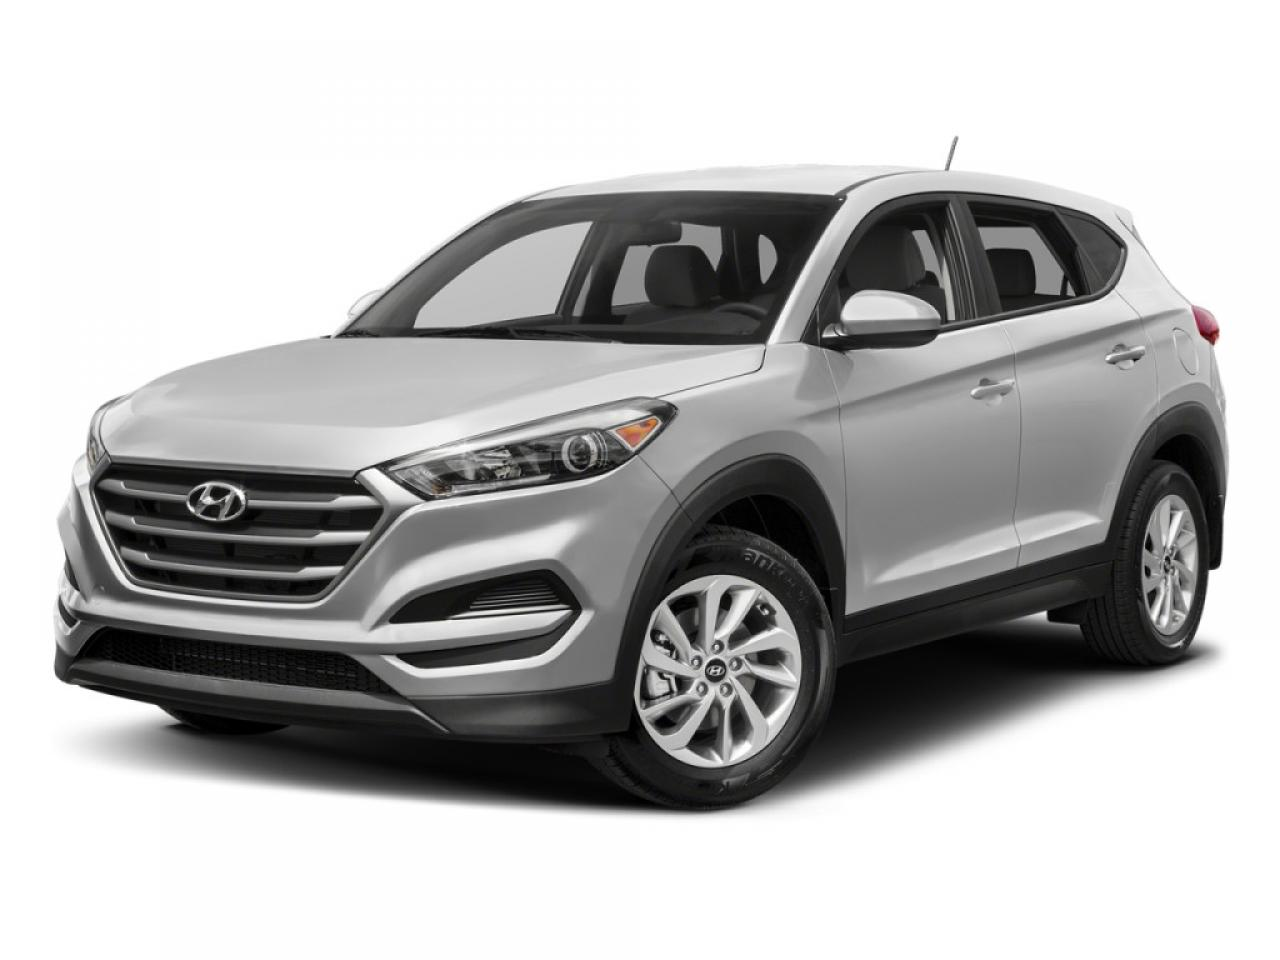 2018 Hyundai Tucson 2.0L FWD NO OPTIONS